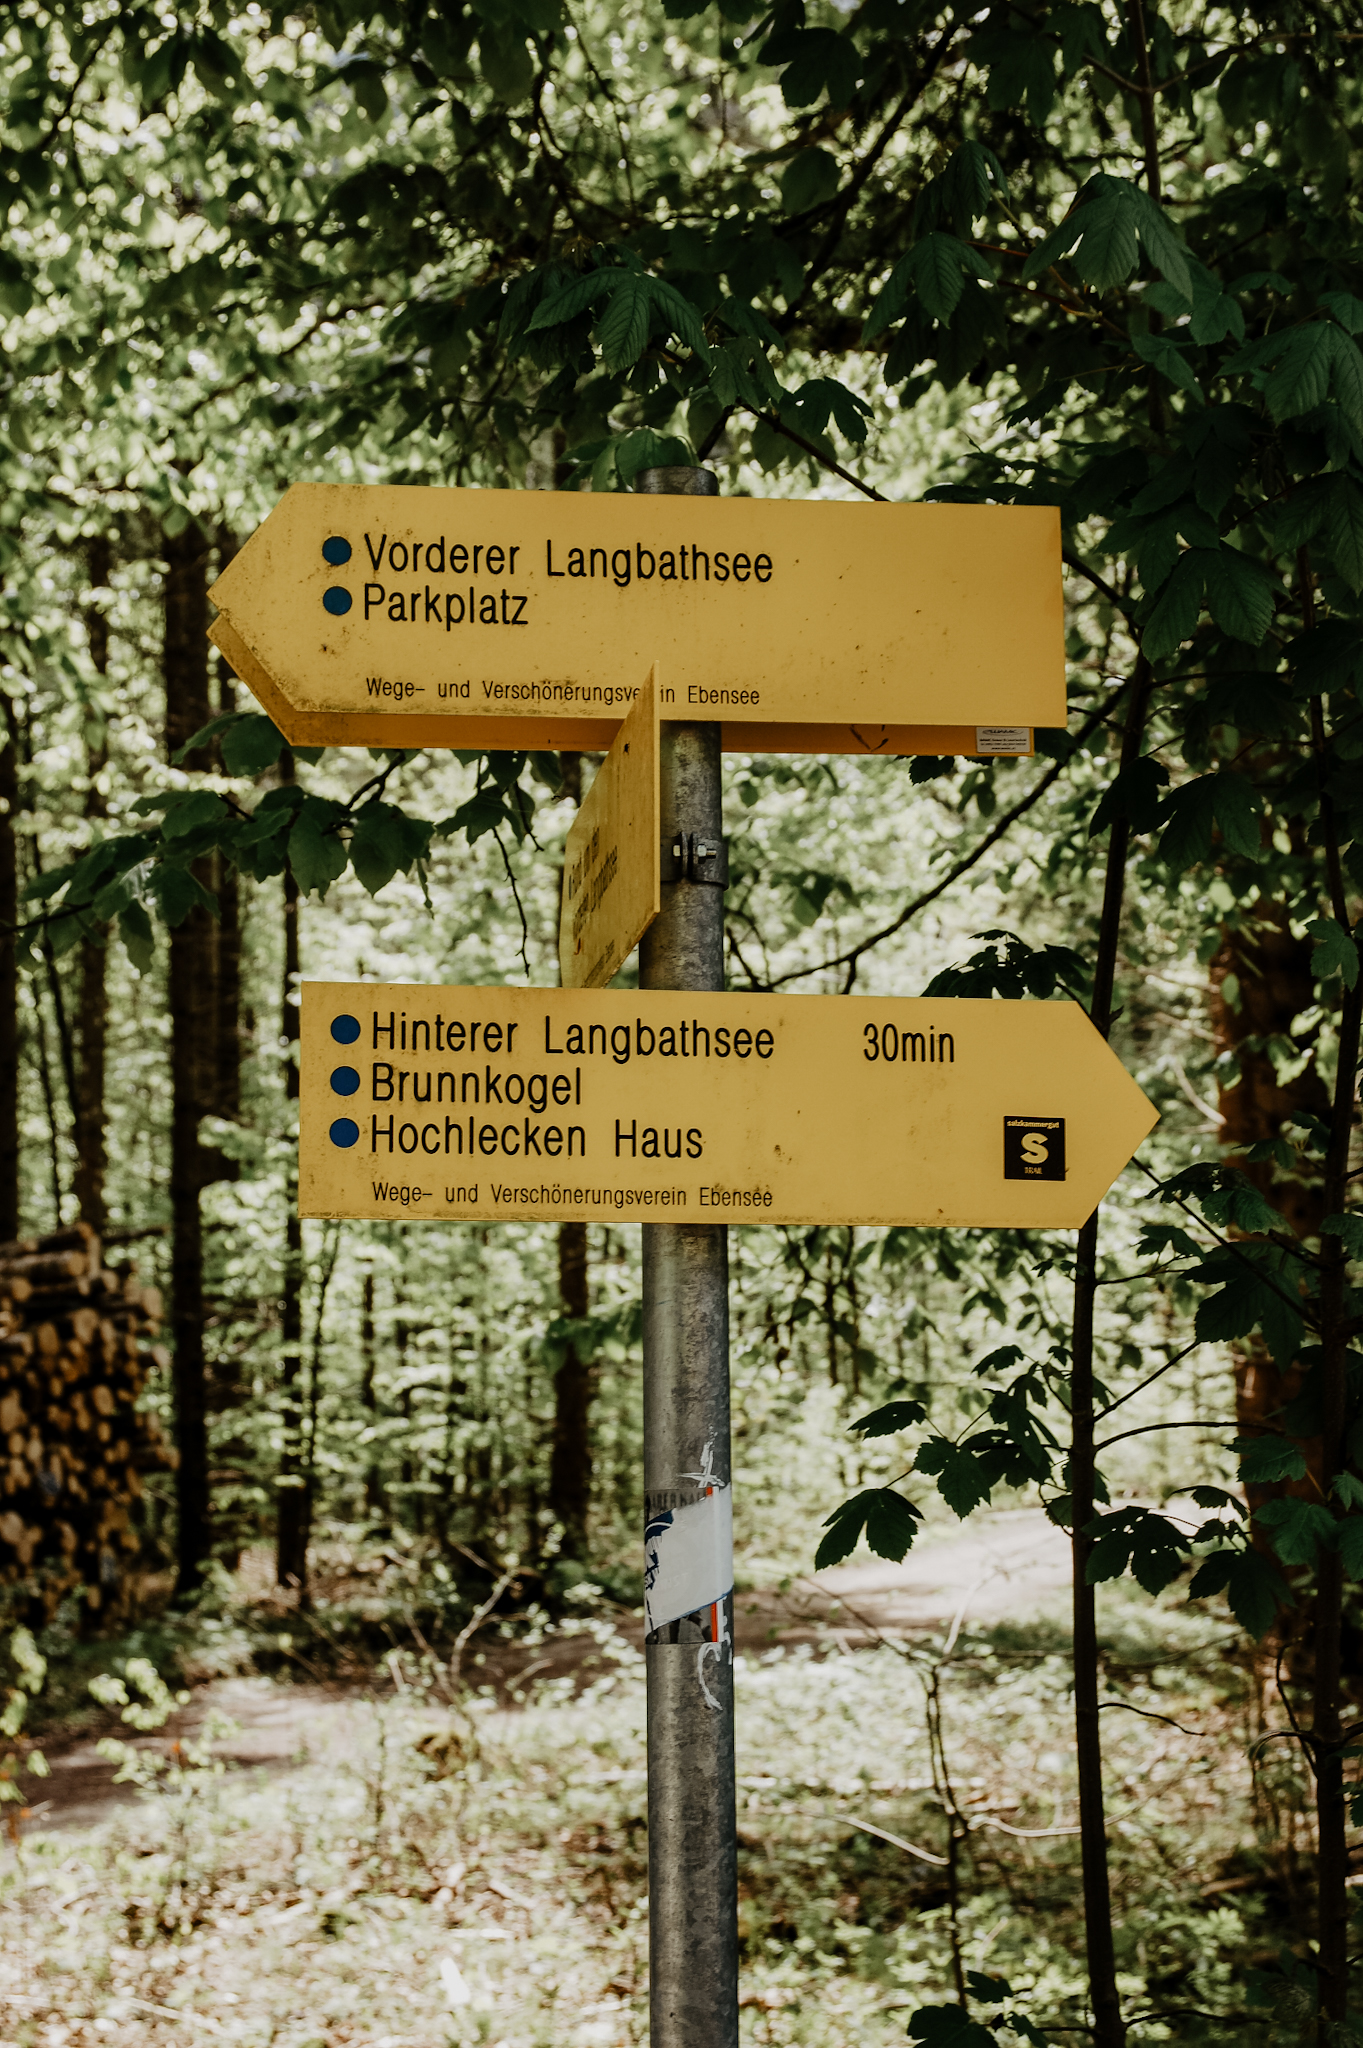 Langbathsee